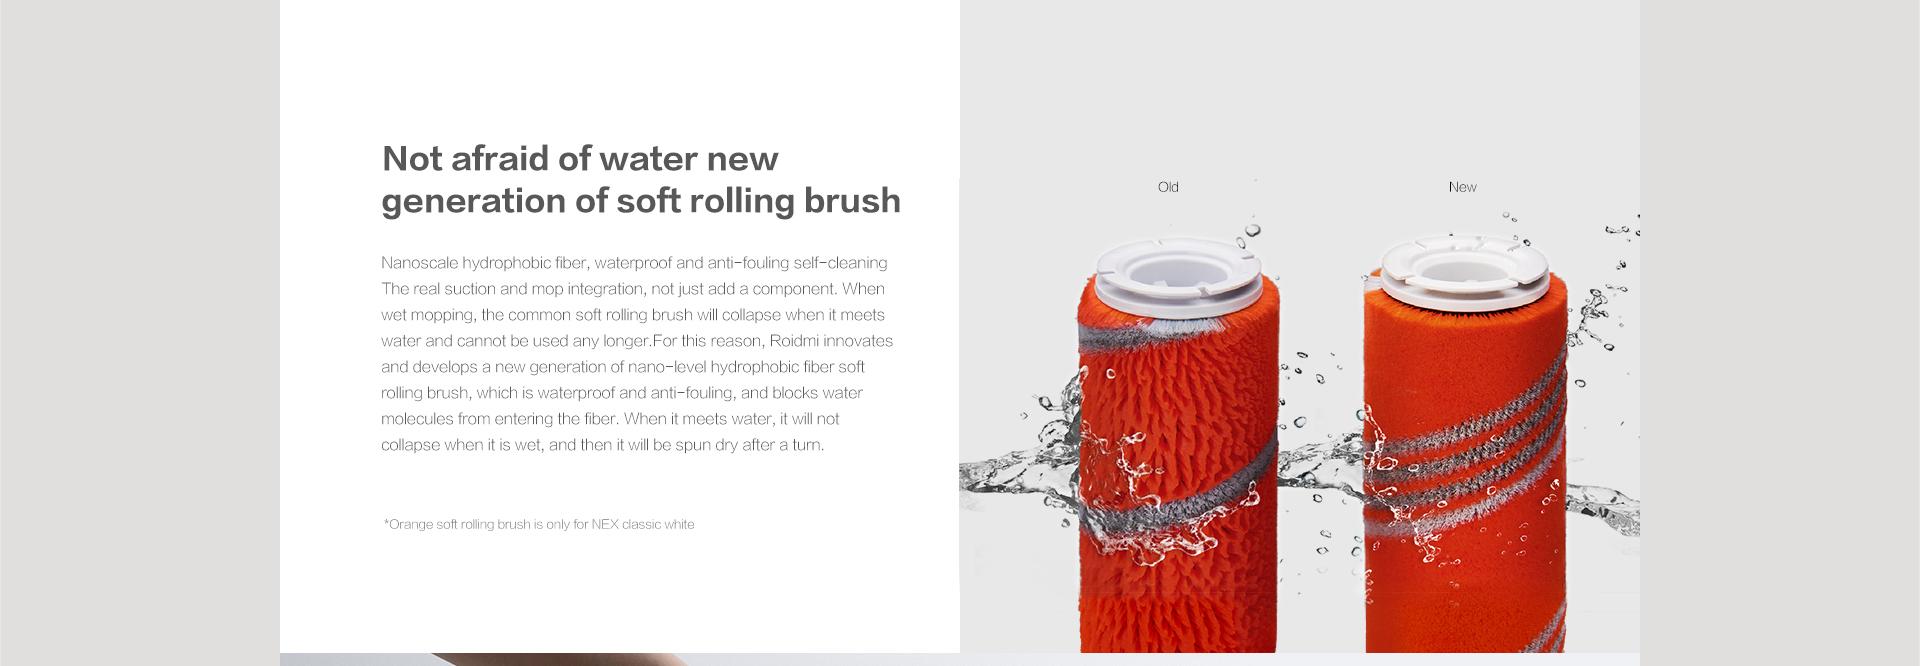 Xiaomi-Roidmi-NEX-Aspirapolvere-Senza-Fili (8).jpg